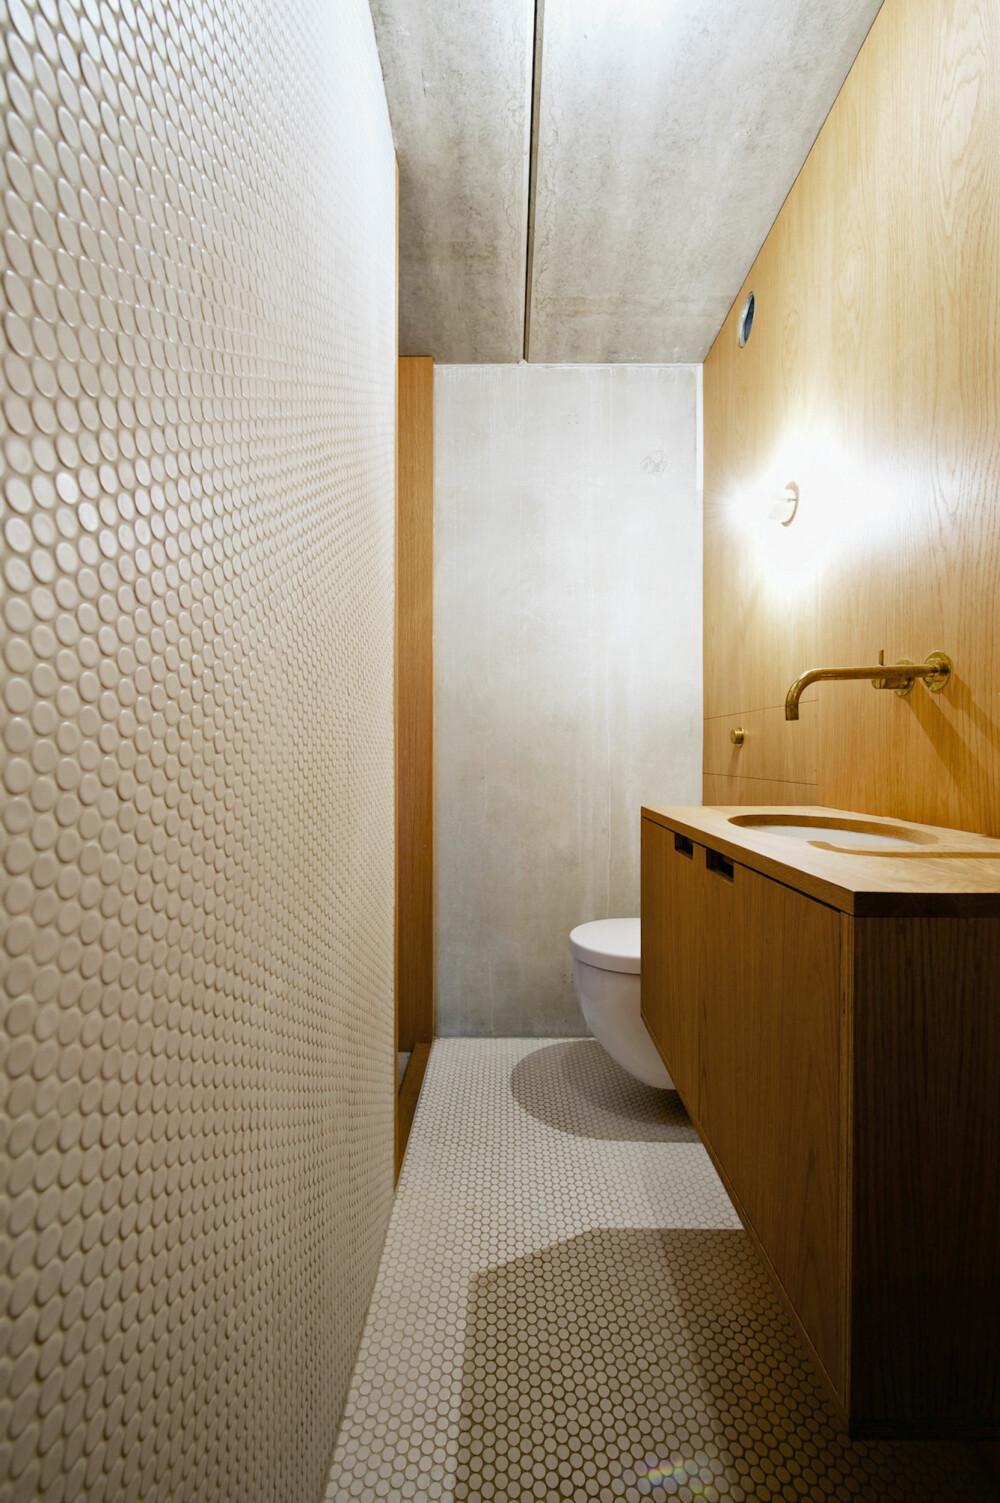 STRAMT: Hele husets formuttrykk er stramt og kjølig. Det kommer også til uttrykk på badet, som også er smalt og avlangt, lik hele huset.